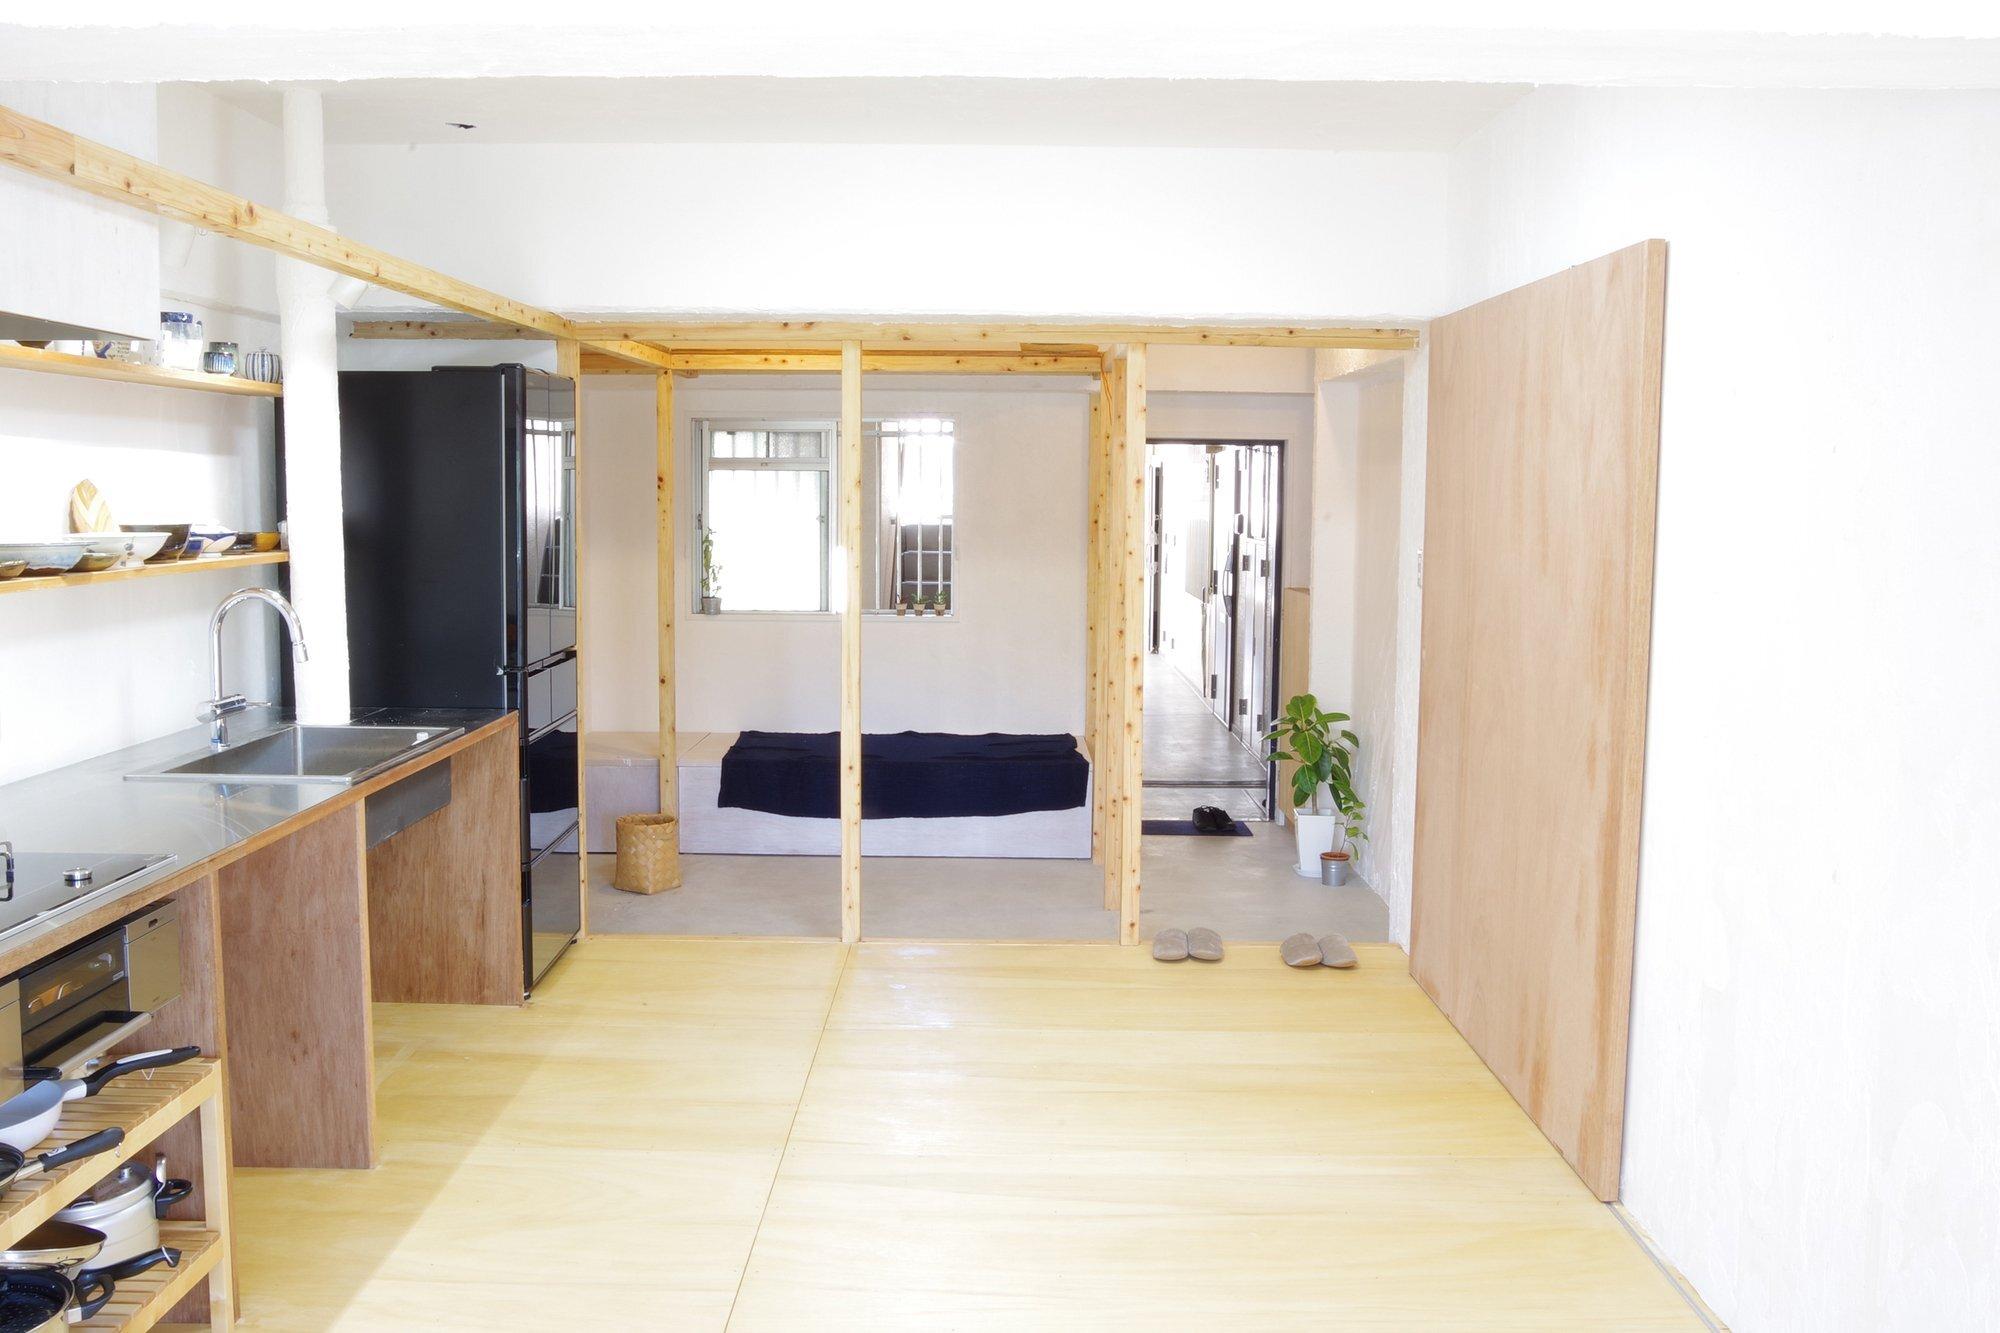 frame-house-peak-studio-kawasaki-japan-living-area-humble-homes